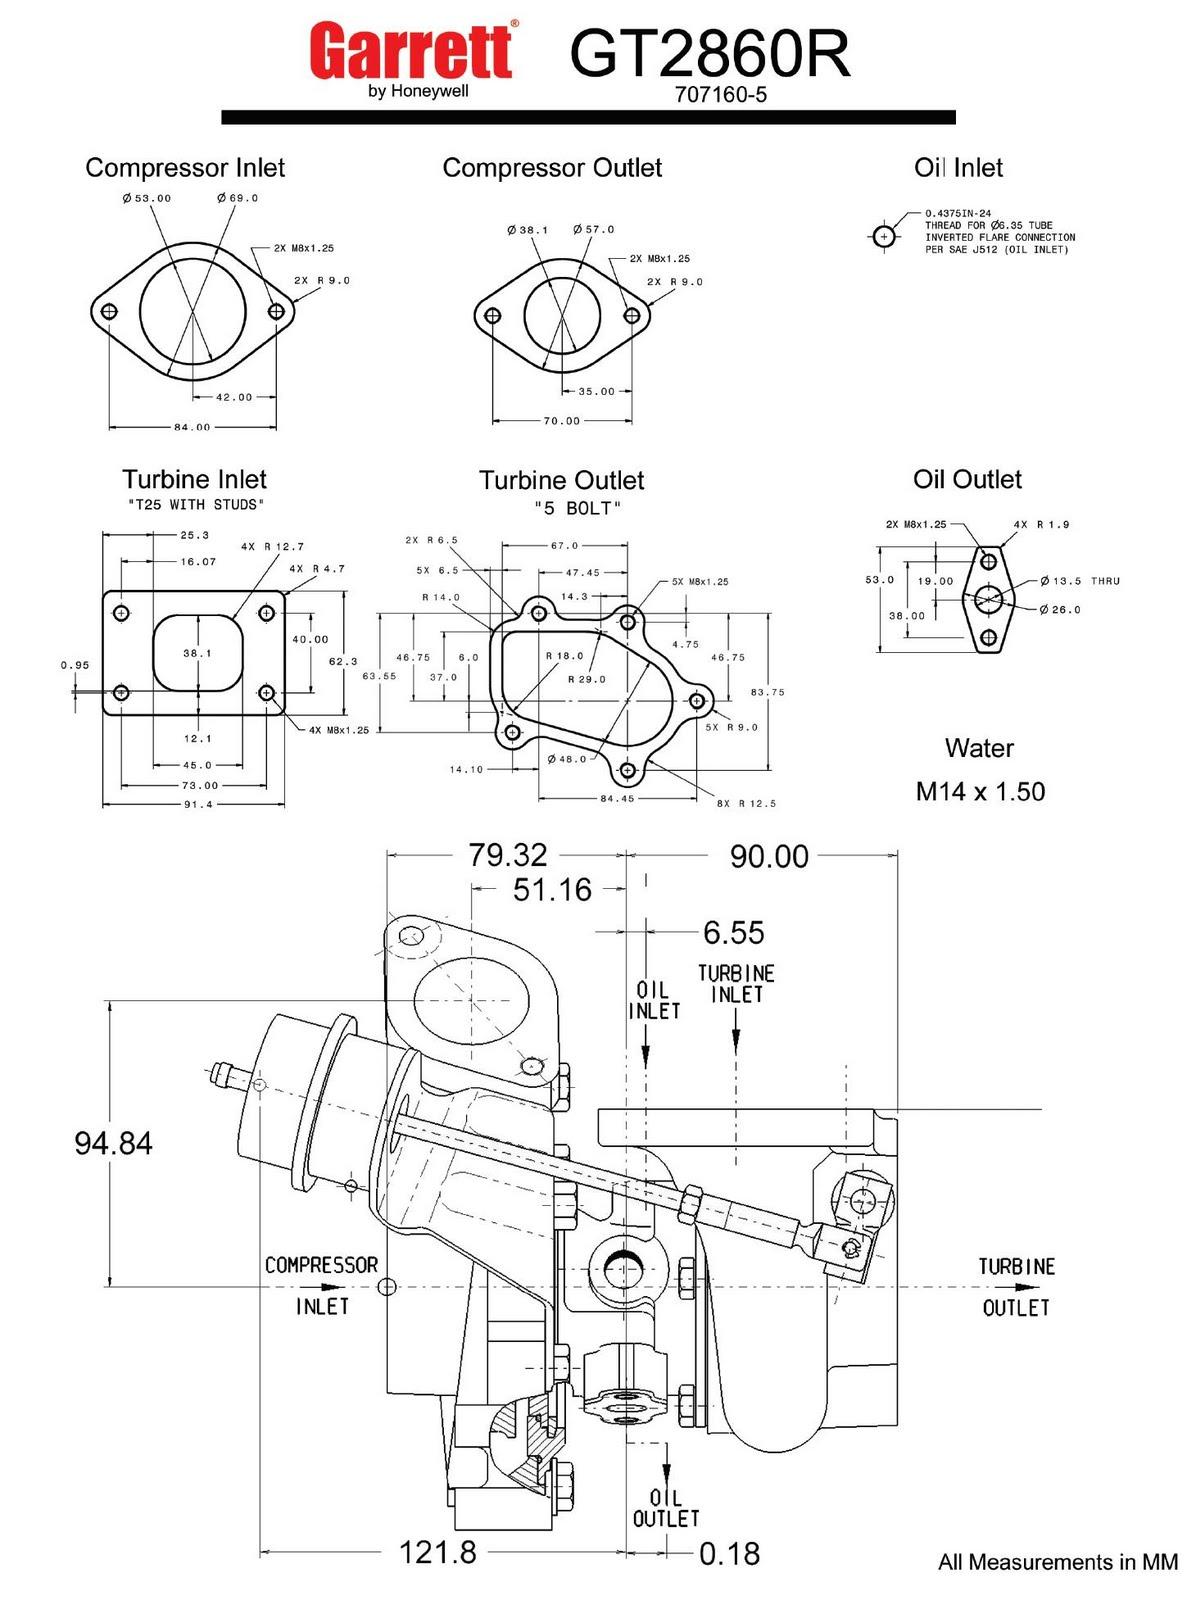 July Turbocharger Specs